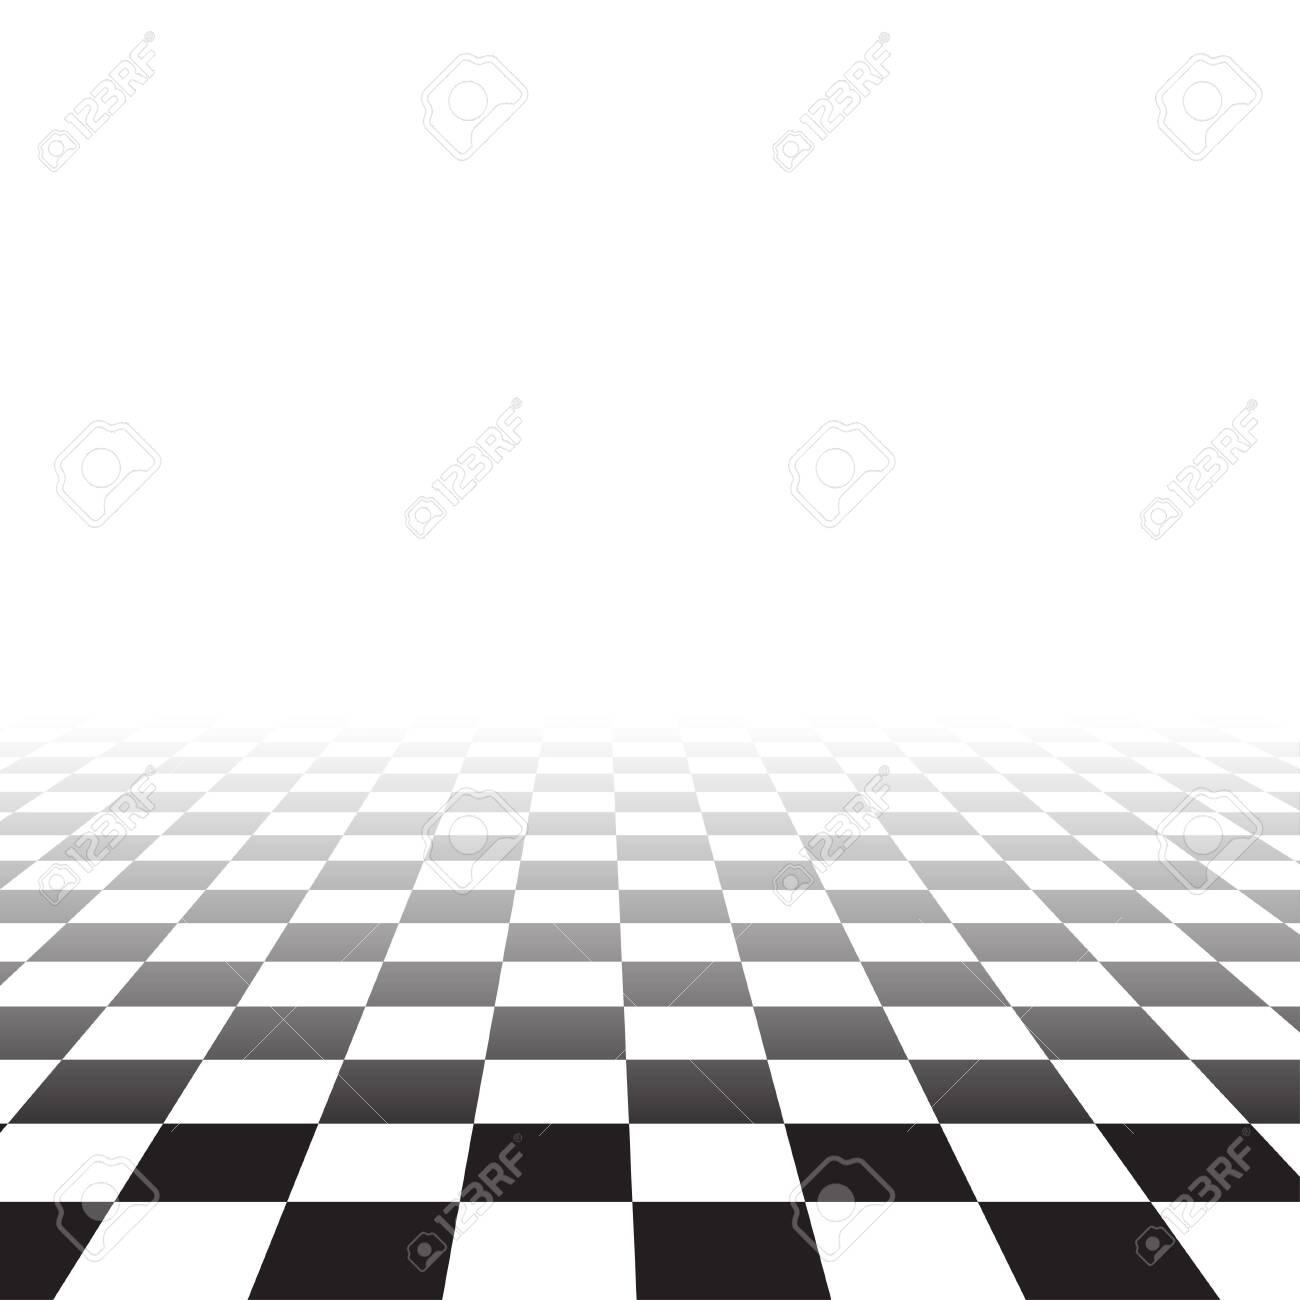 black white random square mosaic tiles background perspective